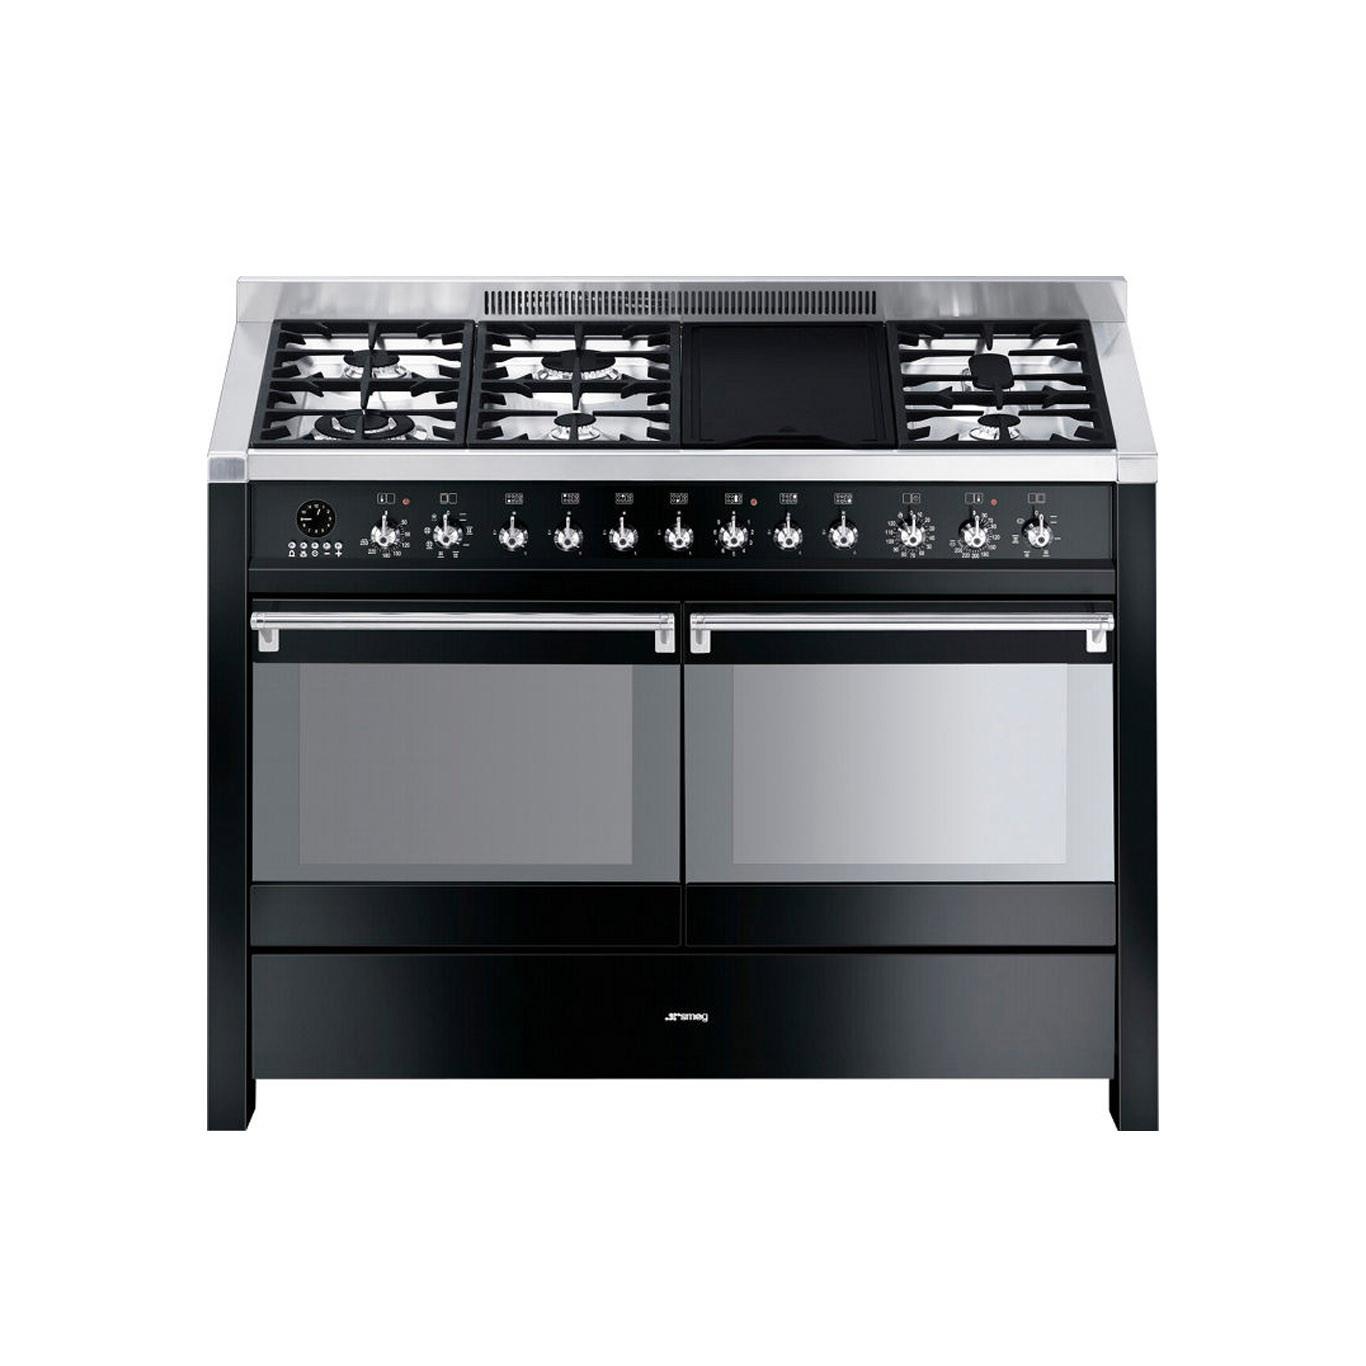 Smeg Opera 120 Dual Fuel Black Range Cooker